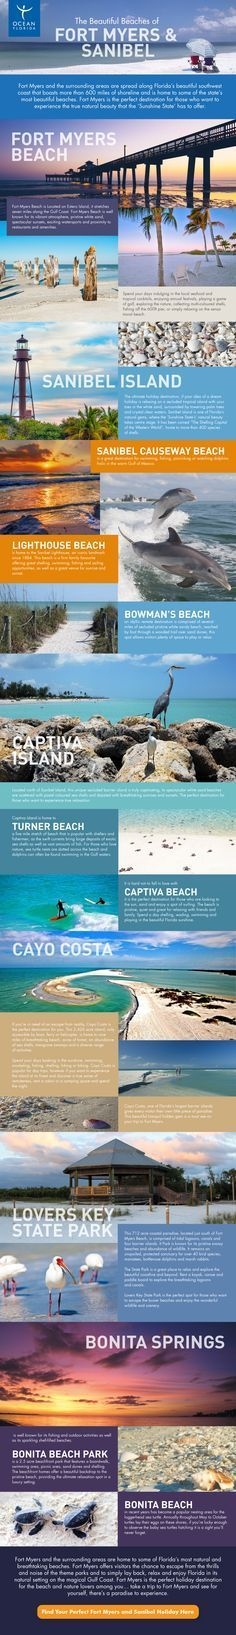 The Beautiful Beaches of Fort Myers & Sanibel - Ocean Florida